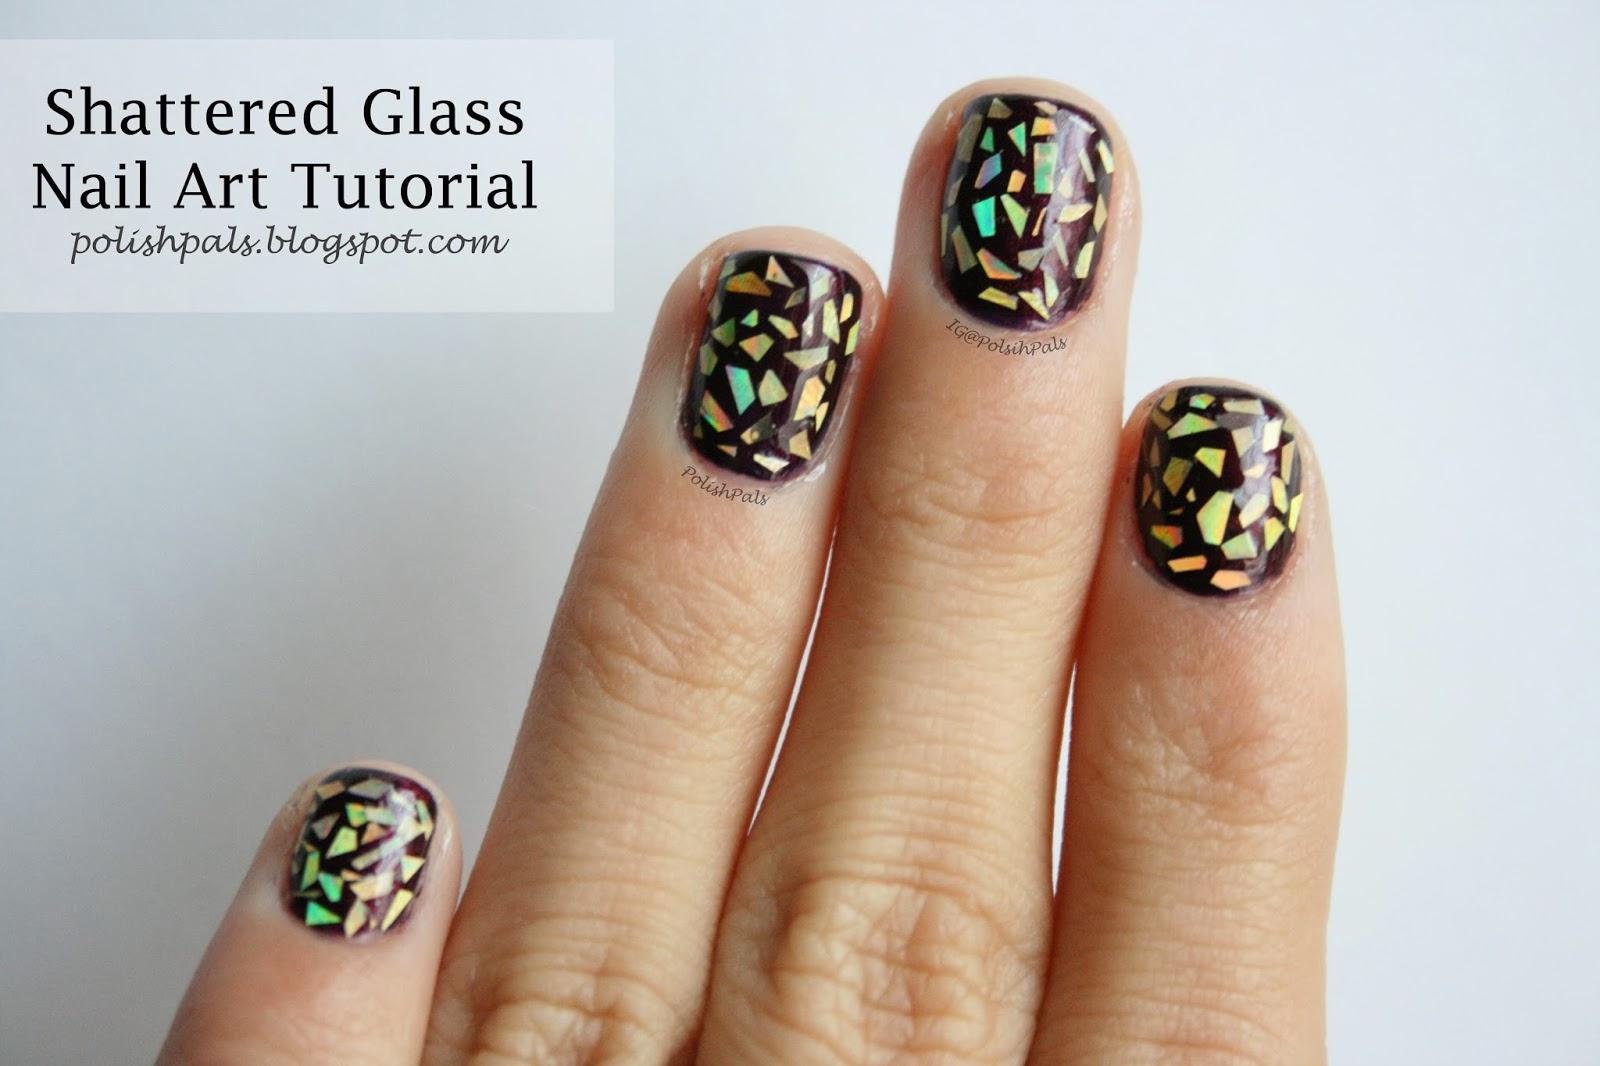 http://polishpals.blogspot.com/2013/12/shattered-glass-nail-tutorial.html